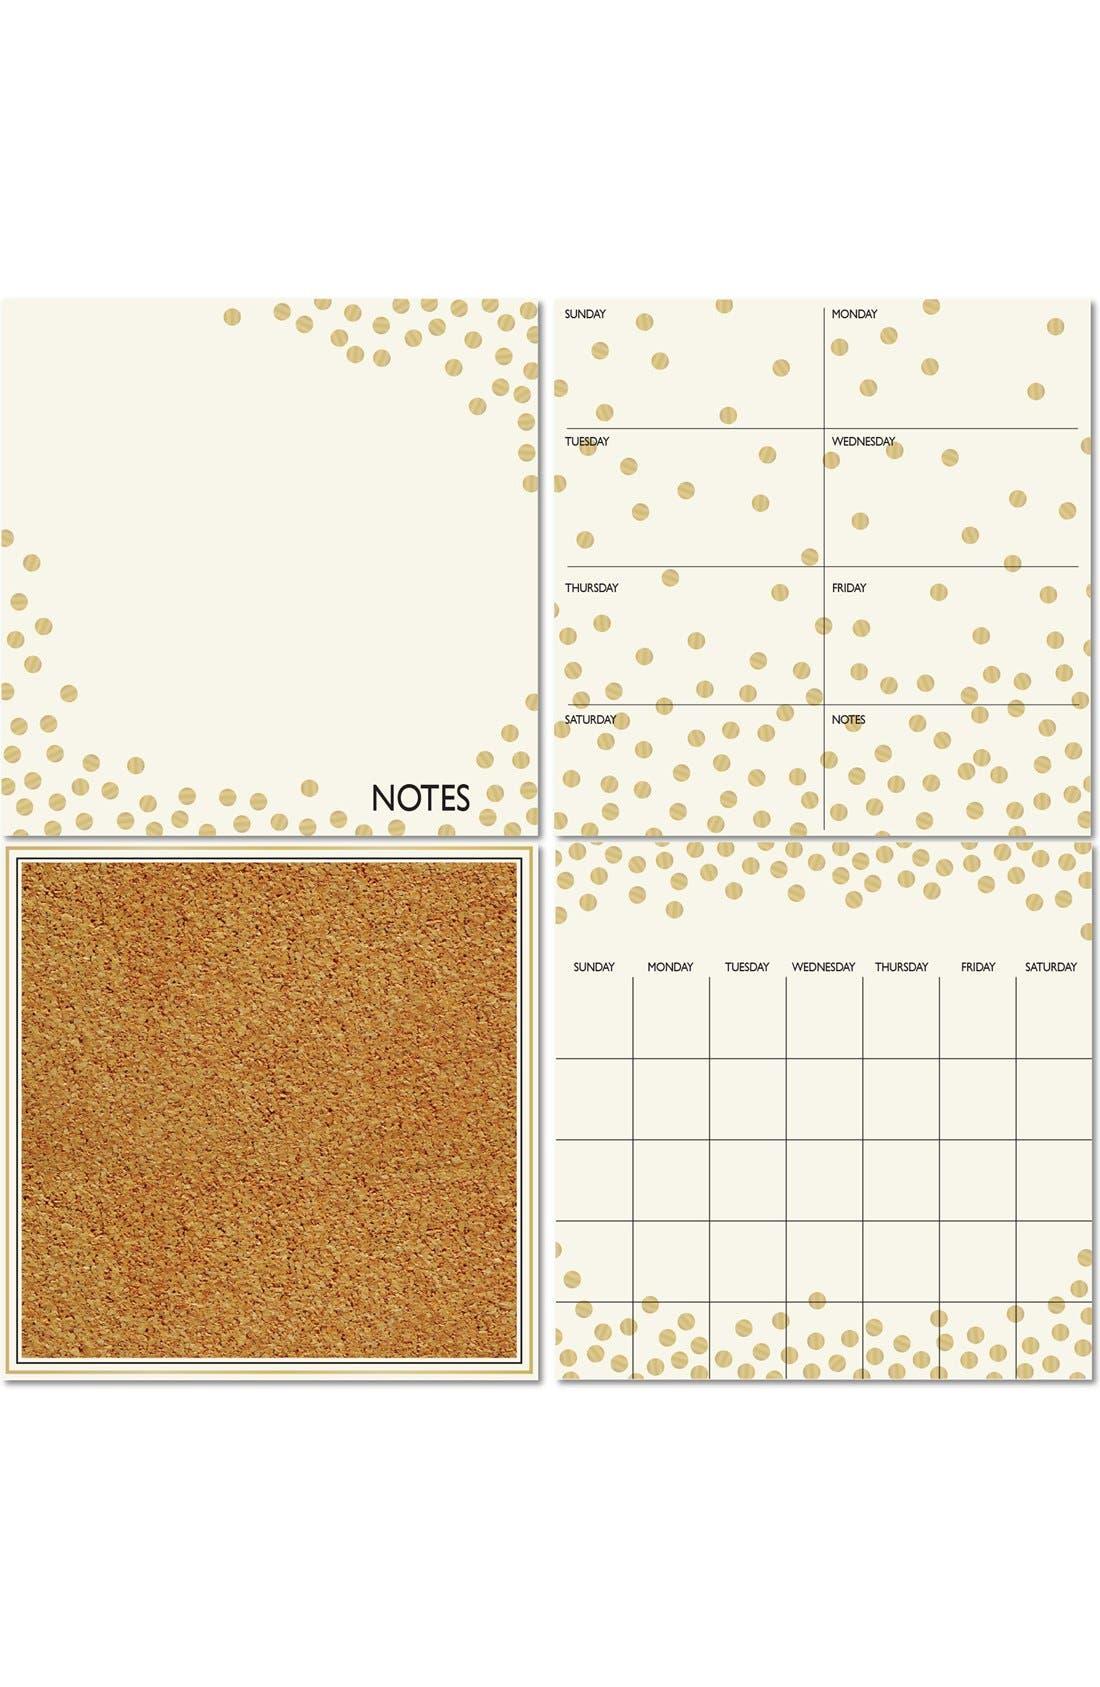 Wallpops 'Confetti' Wall Decal Organization Kit